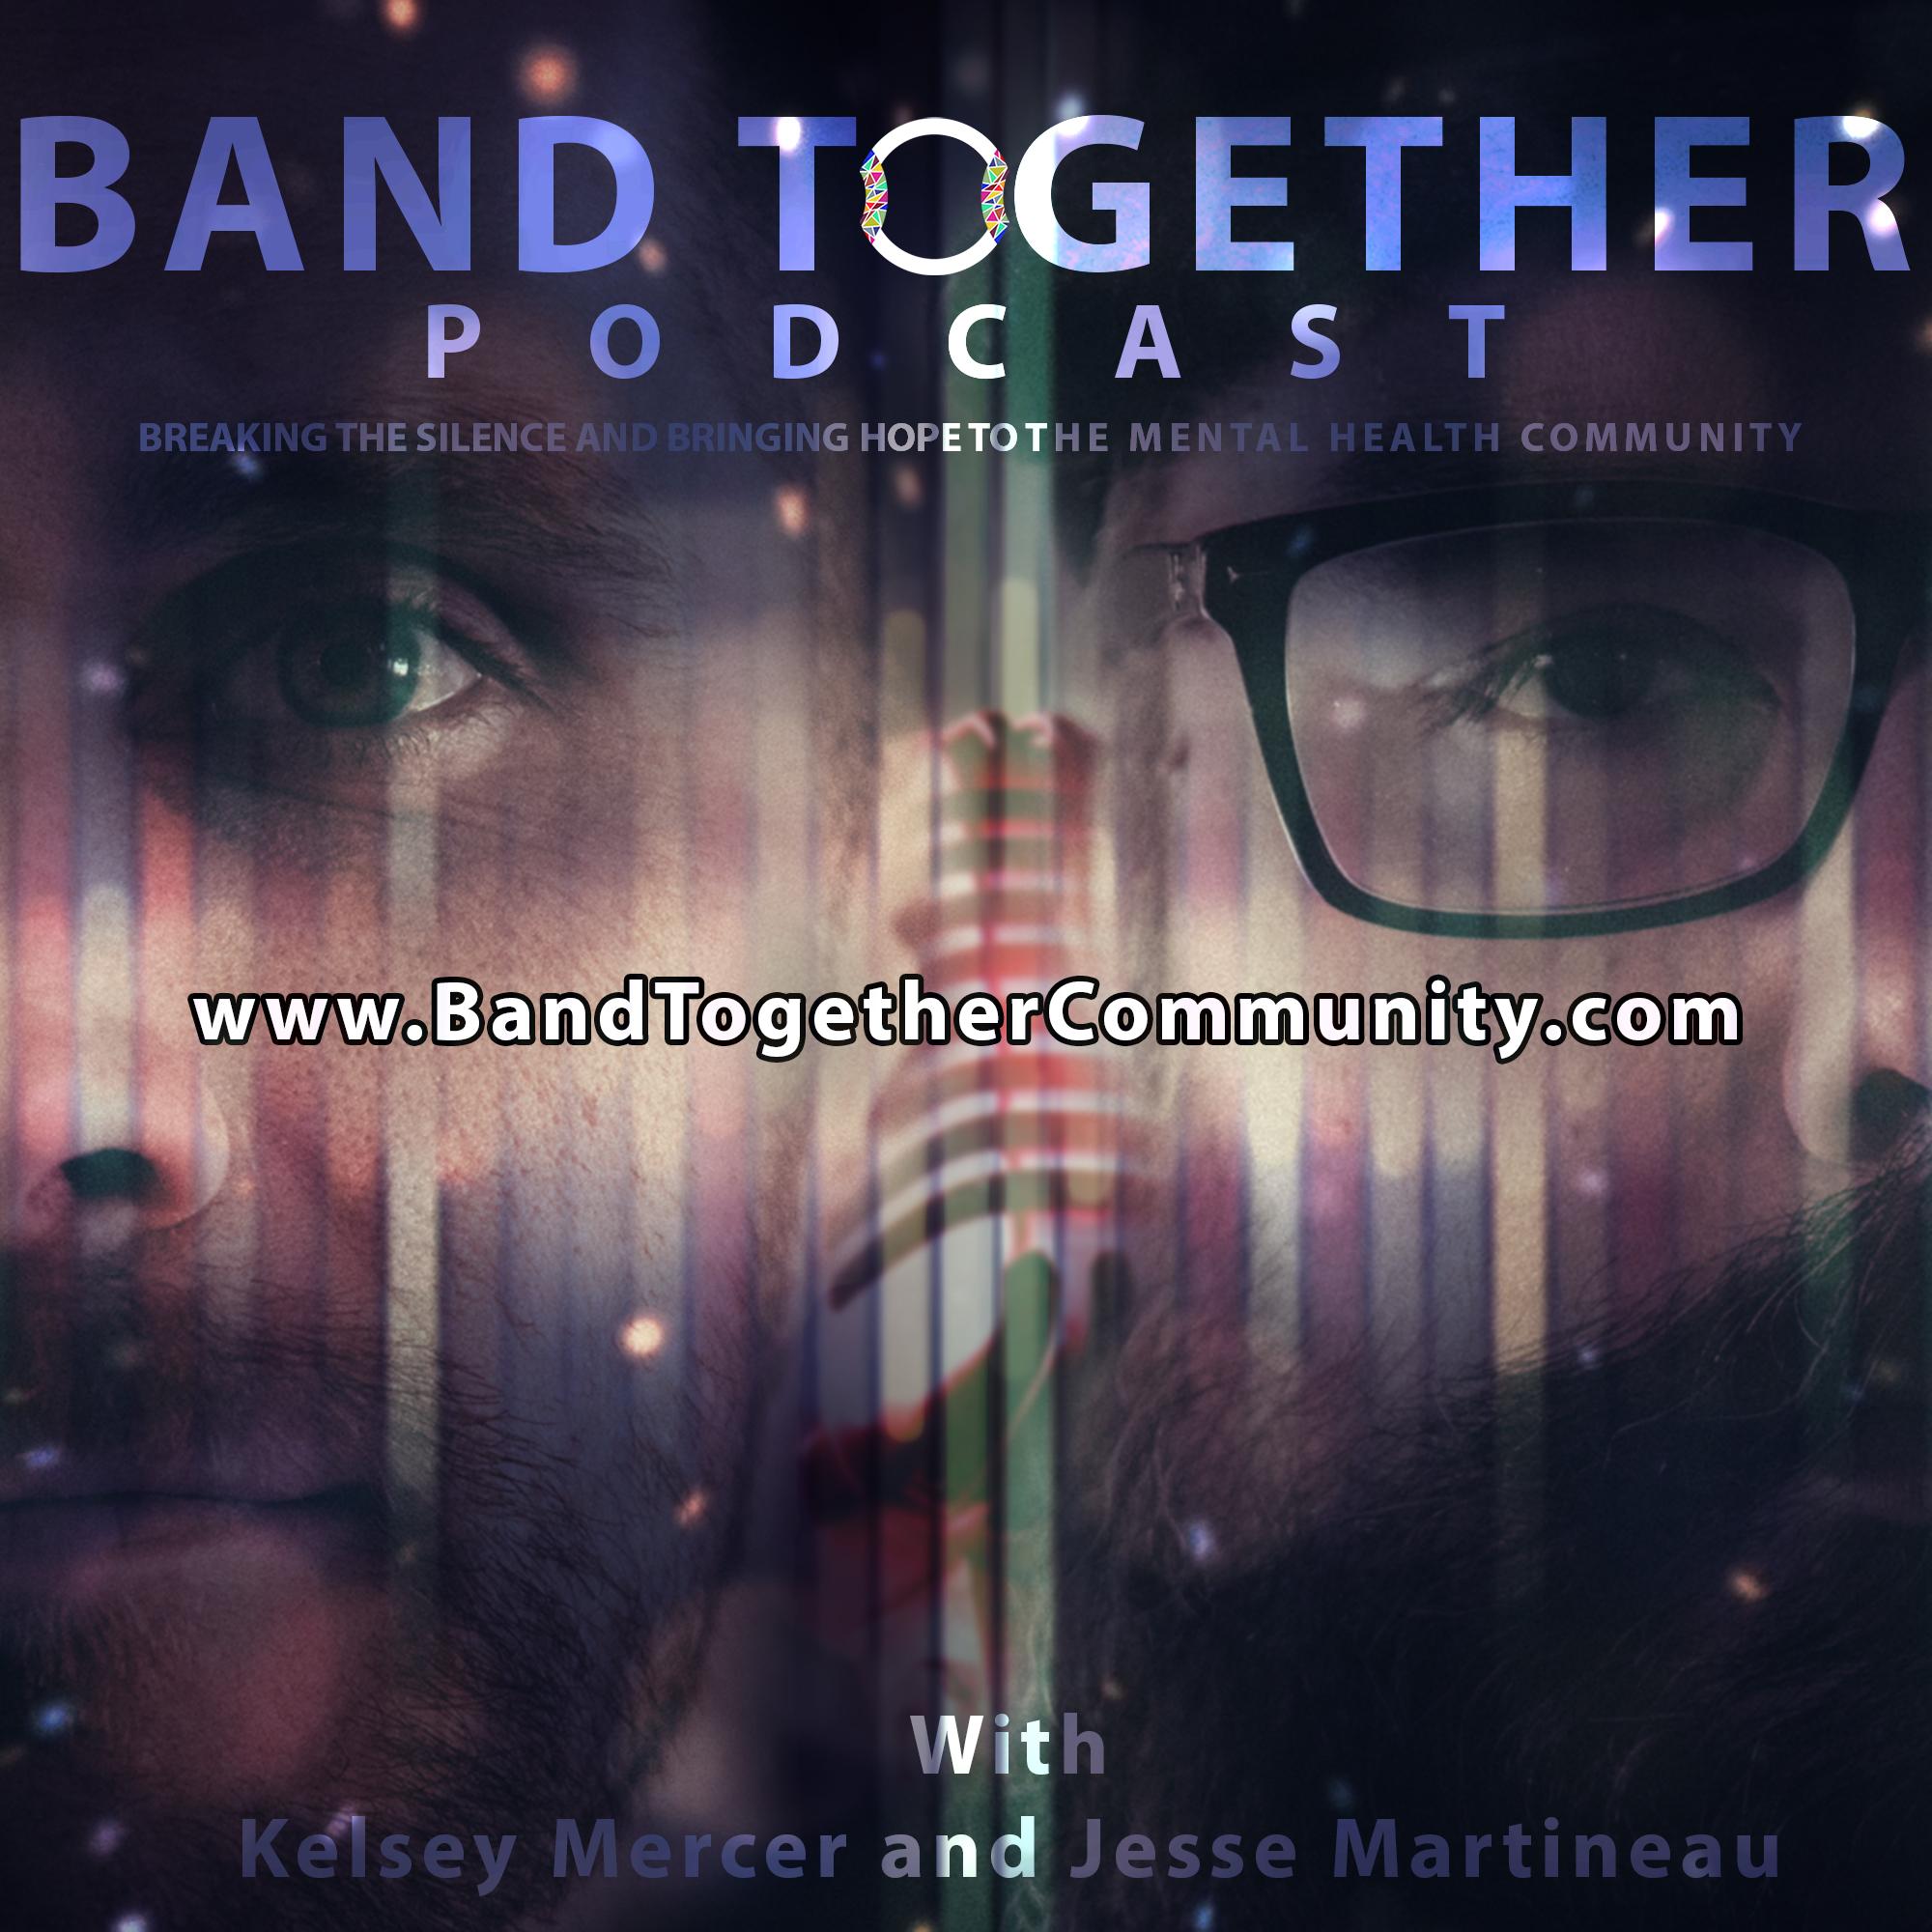 The Bandtogether Podcast show art